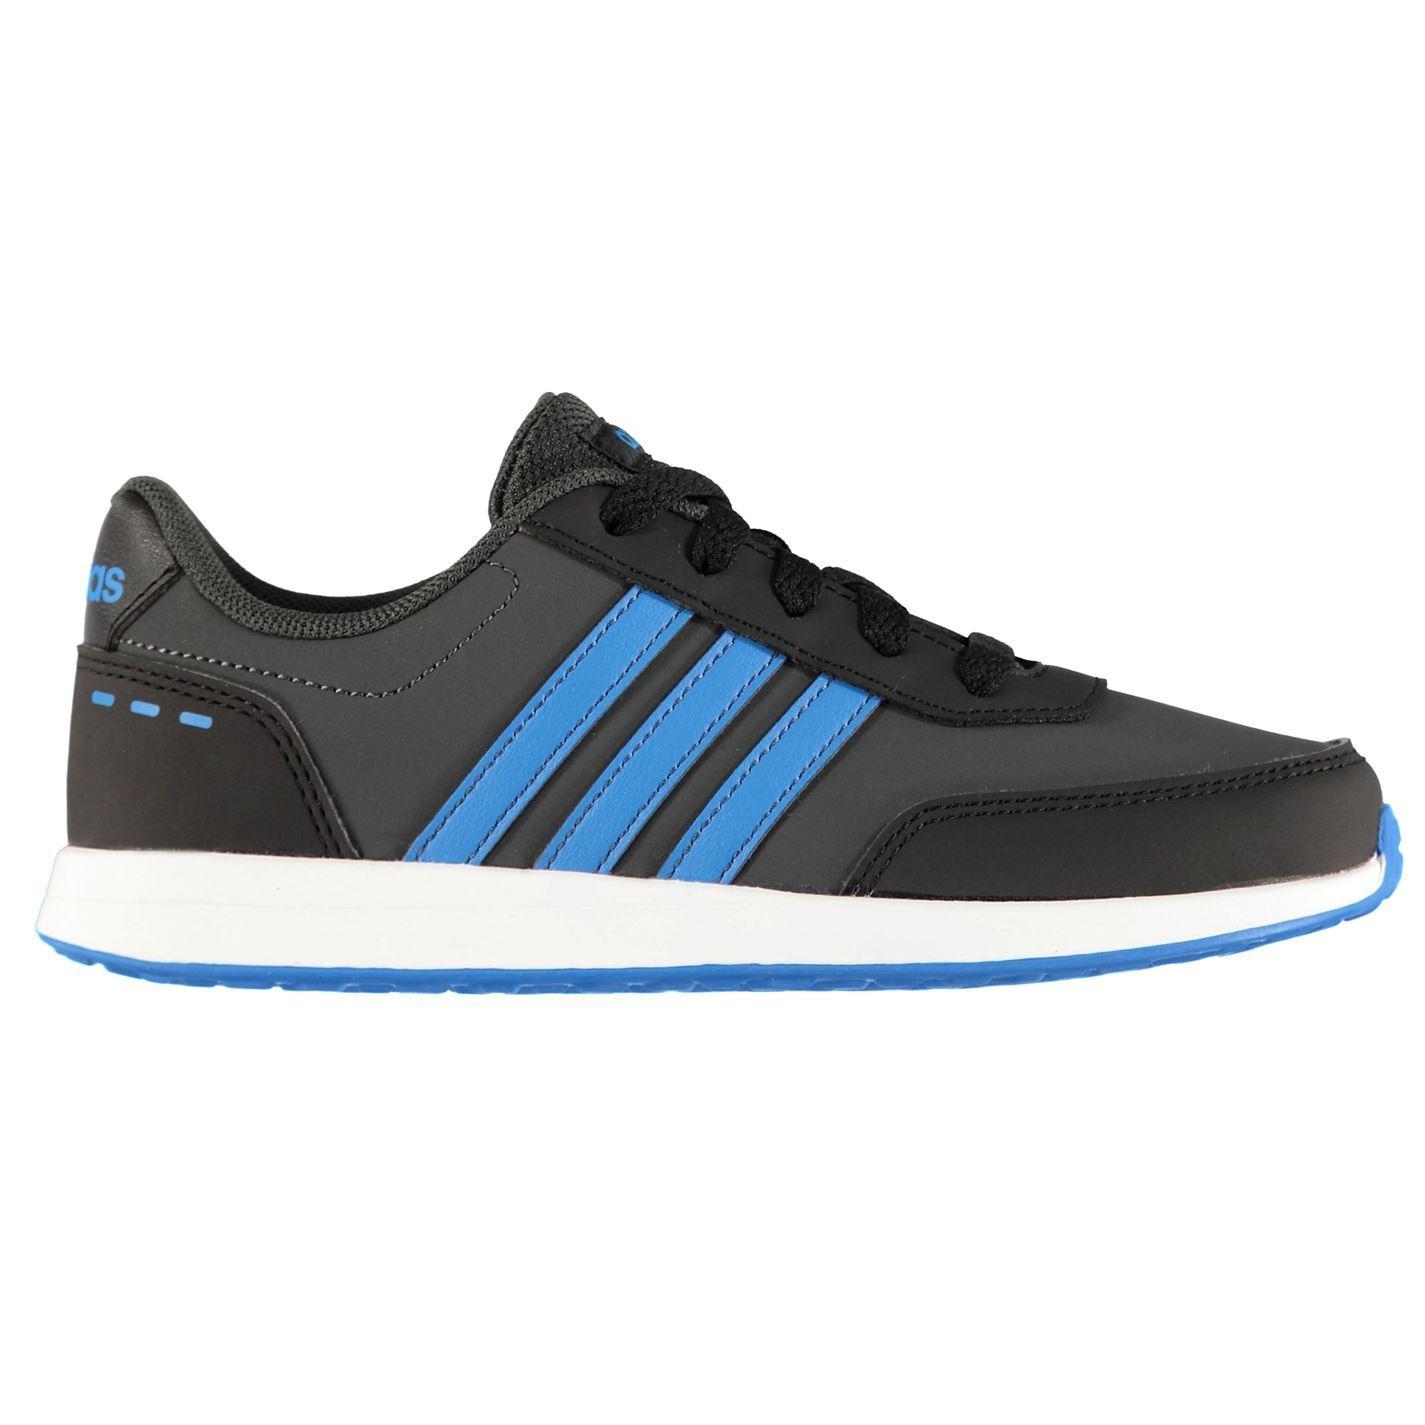 miniatura 9 - ADIDAS-Switch-Nubuck-Scarpe-da-ginnastica-bambino-ragazzo-calzature